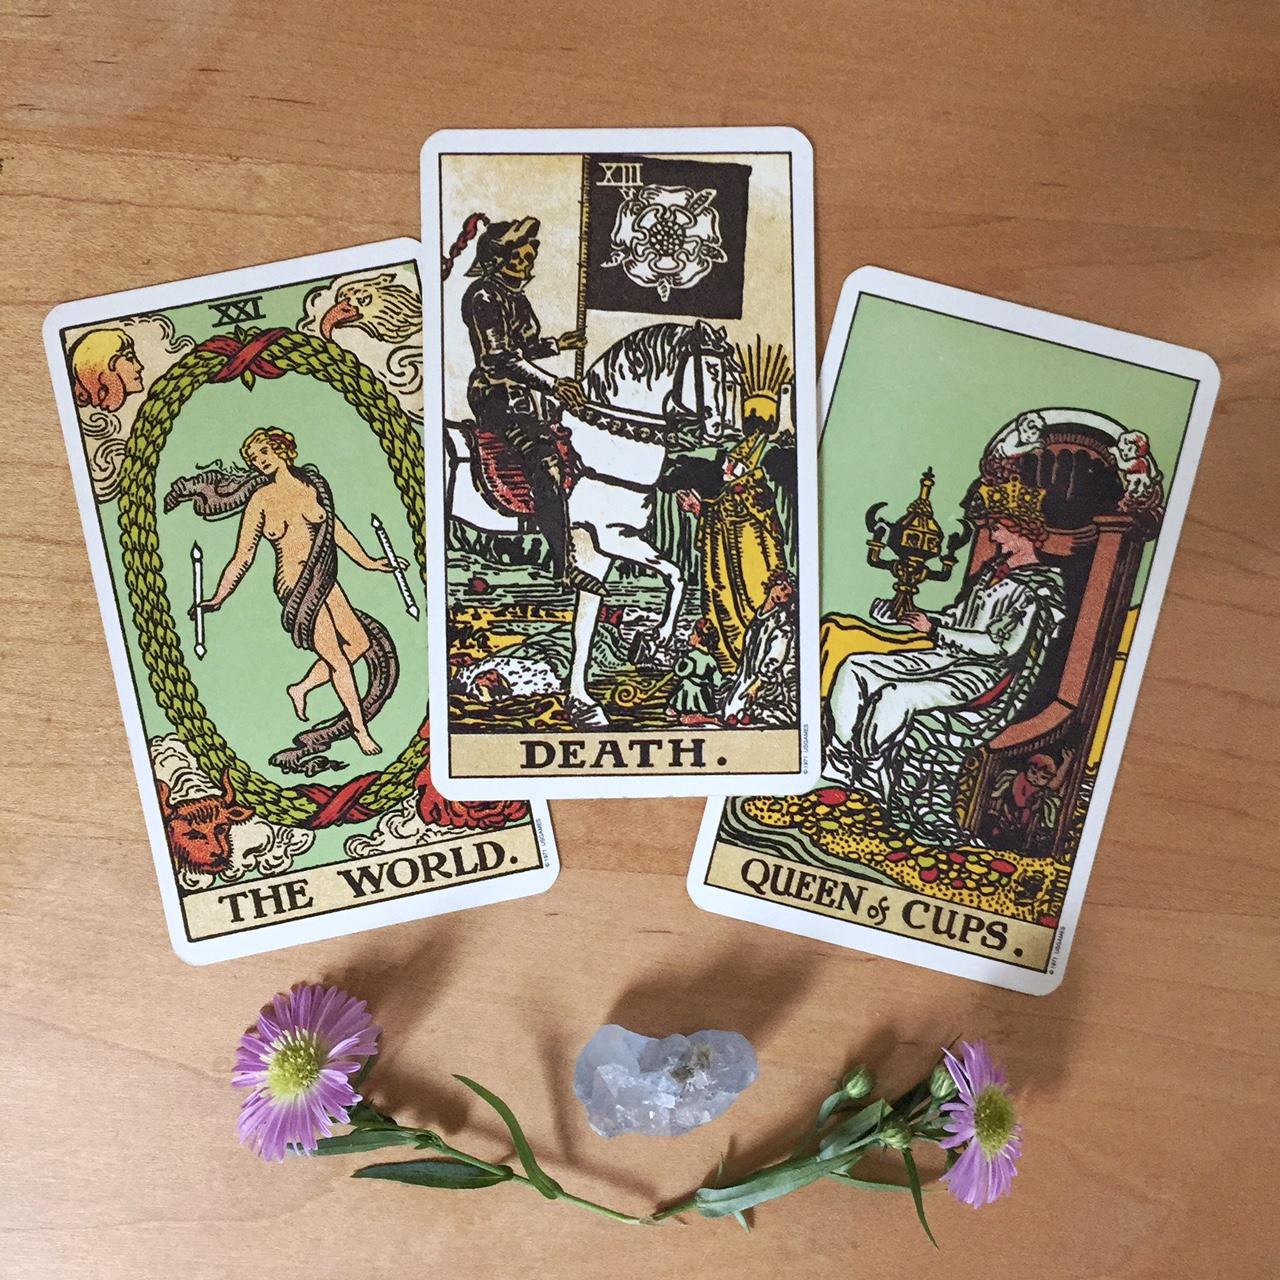 Cards from the Rider-Waite-Smith Tarot